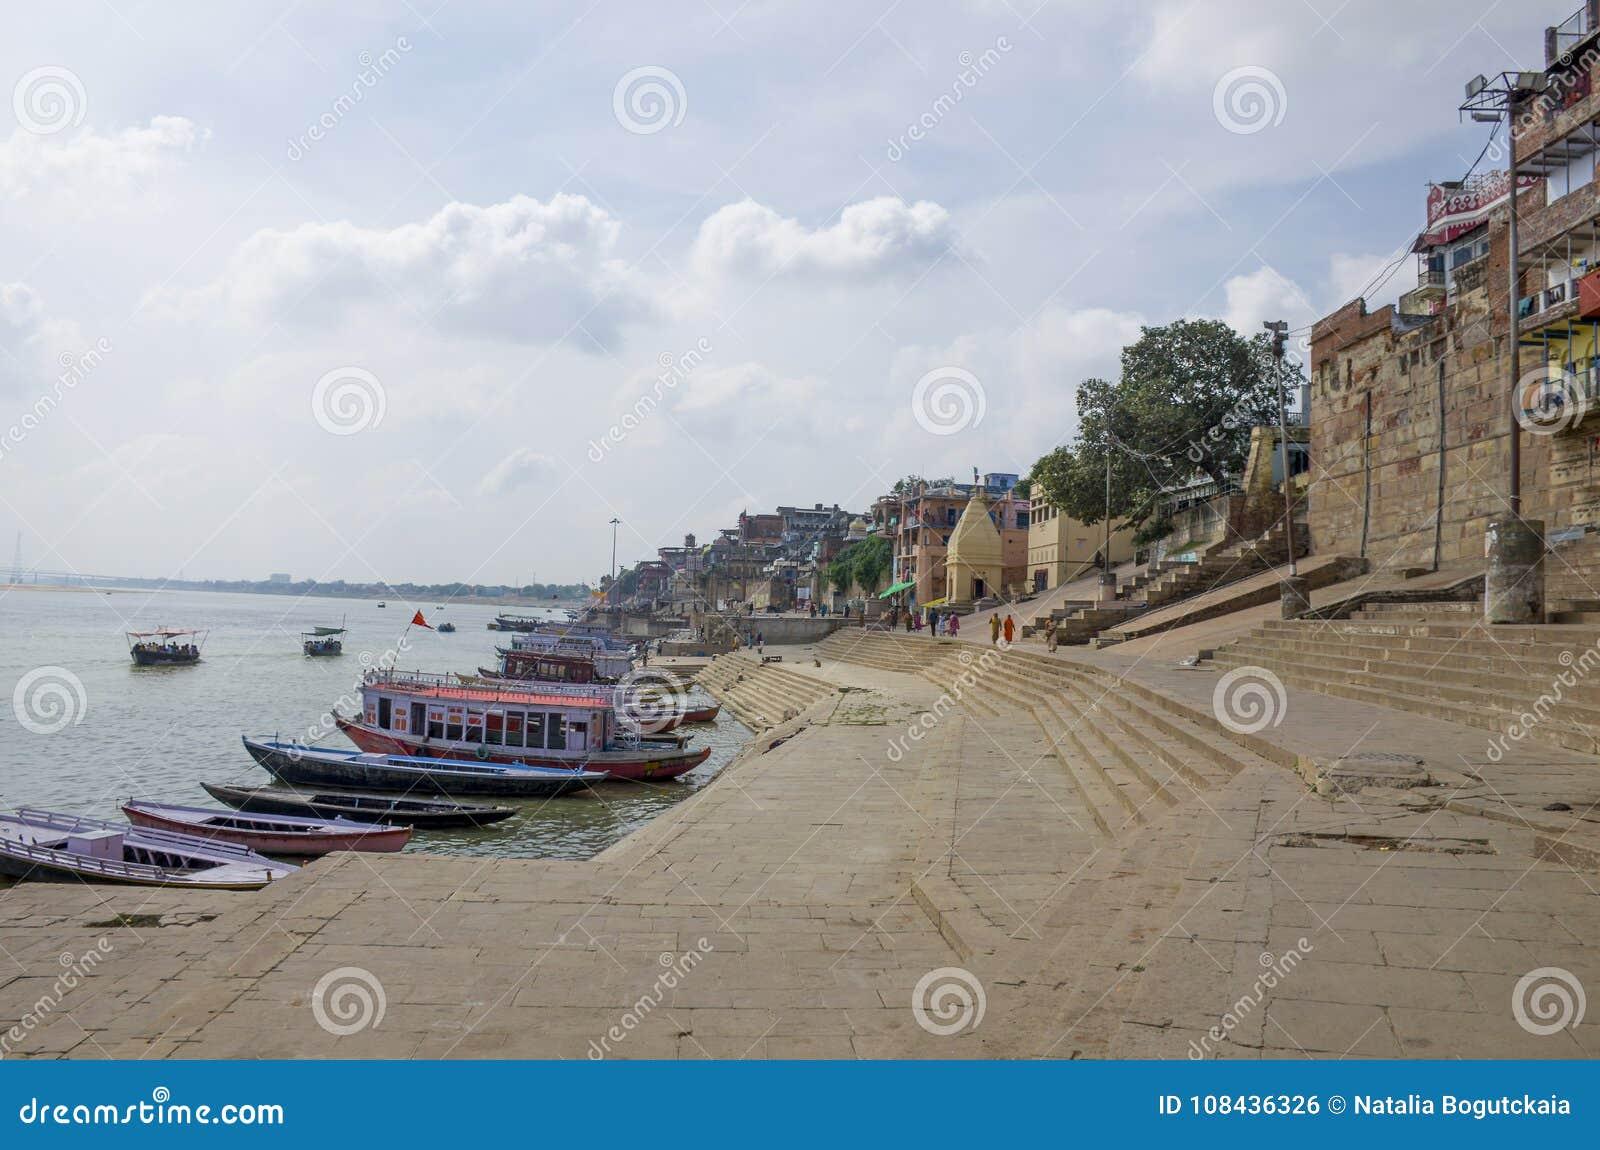 Landscape embankment city of Varanasi Gang River India